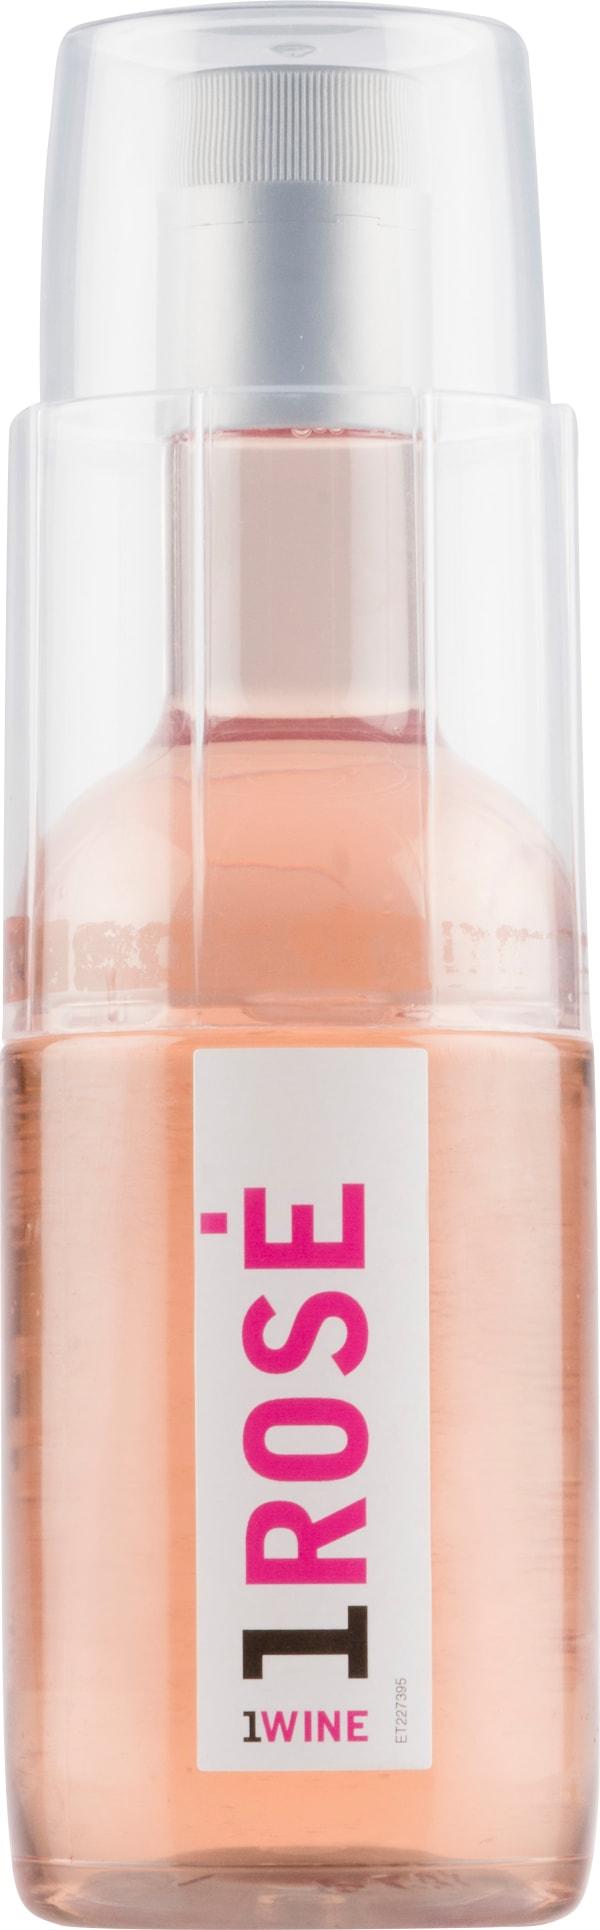 1Wine Rosé plastflaska